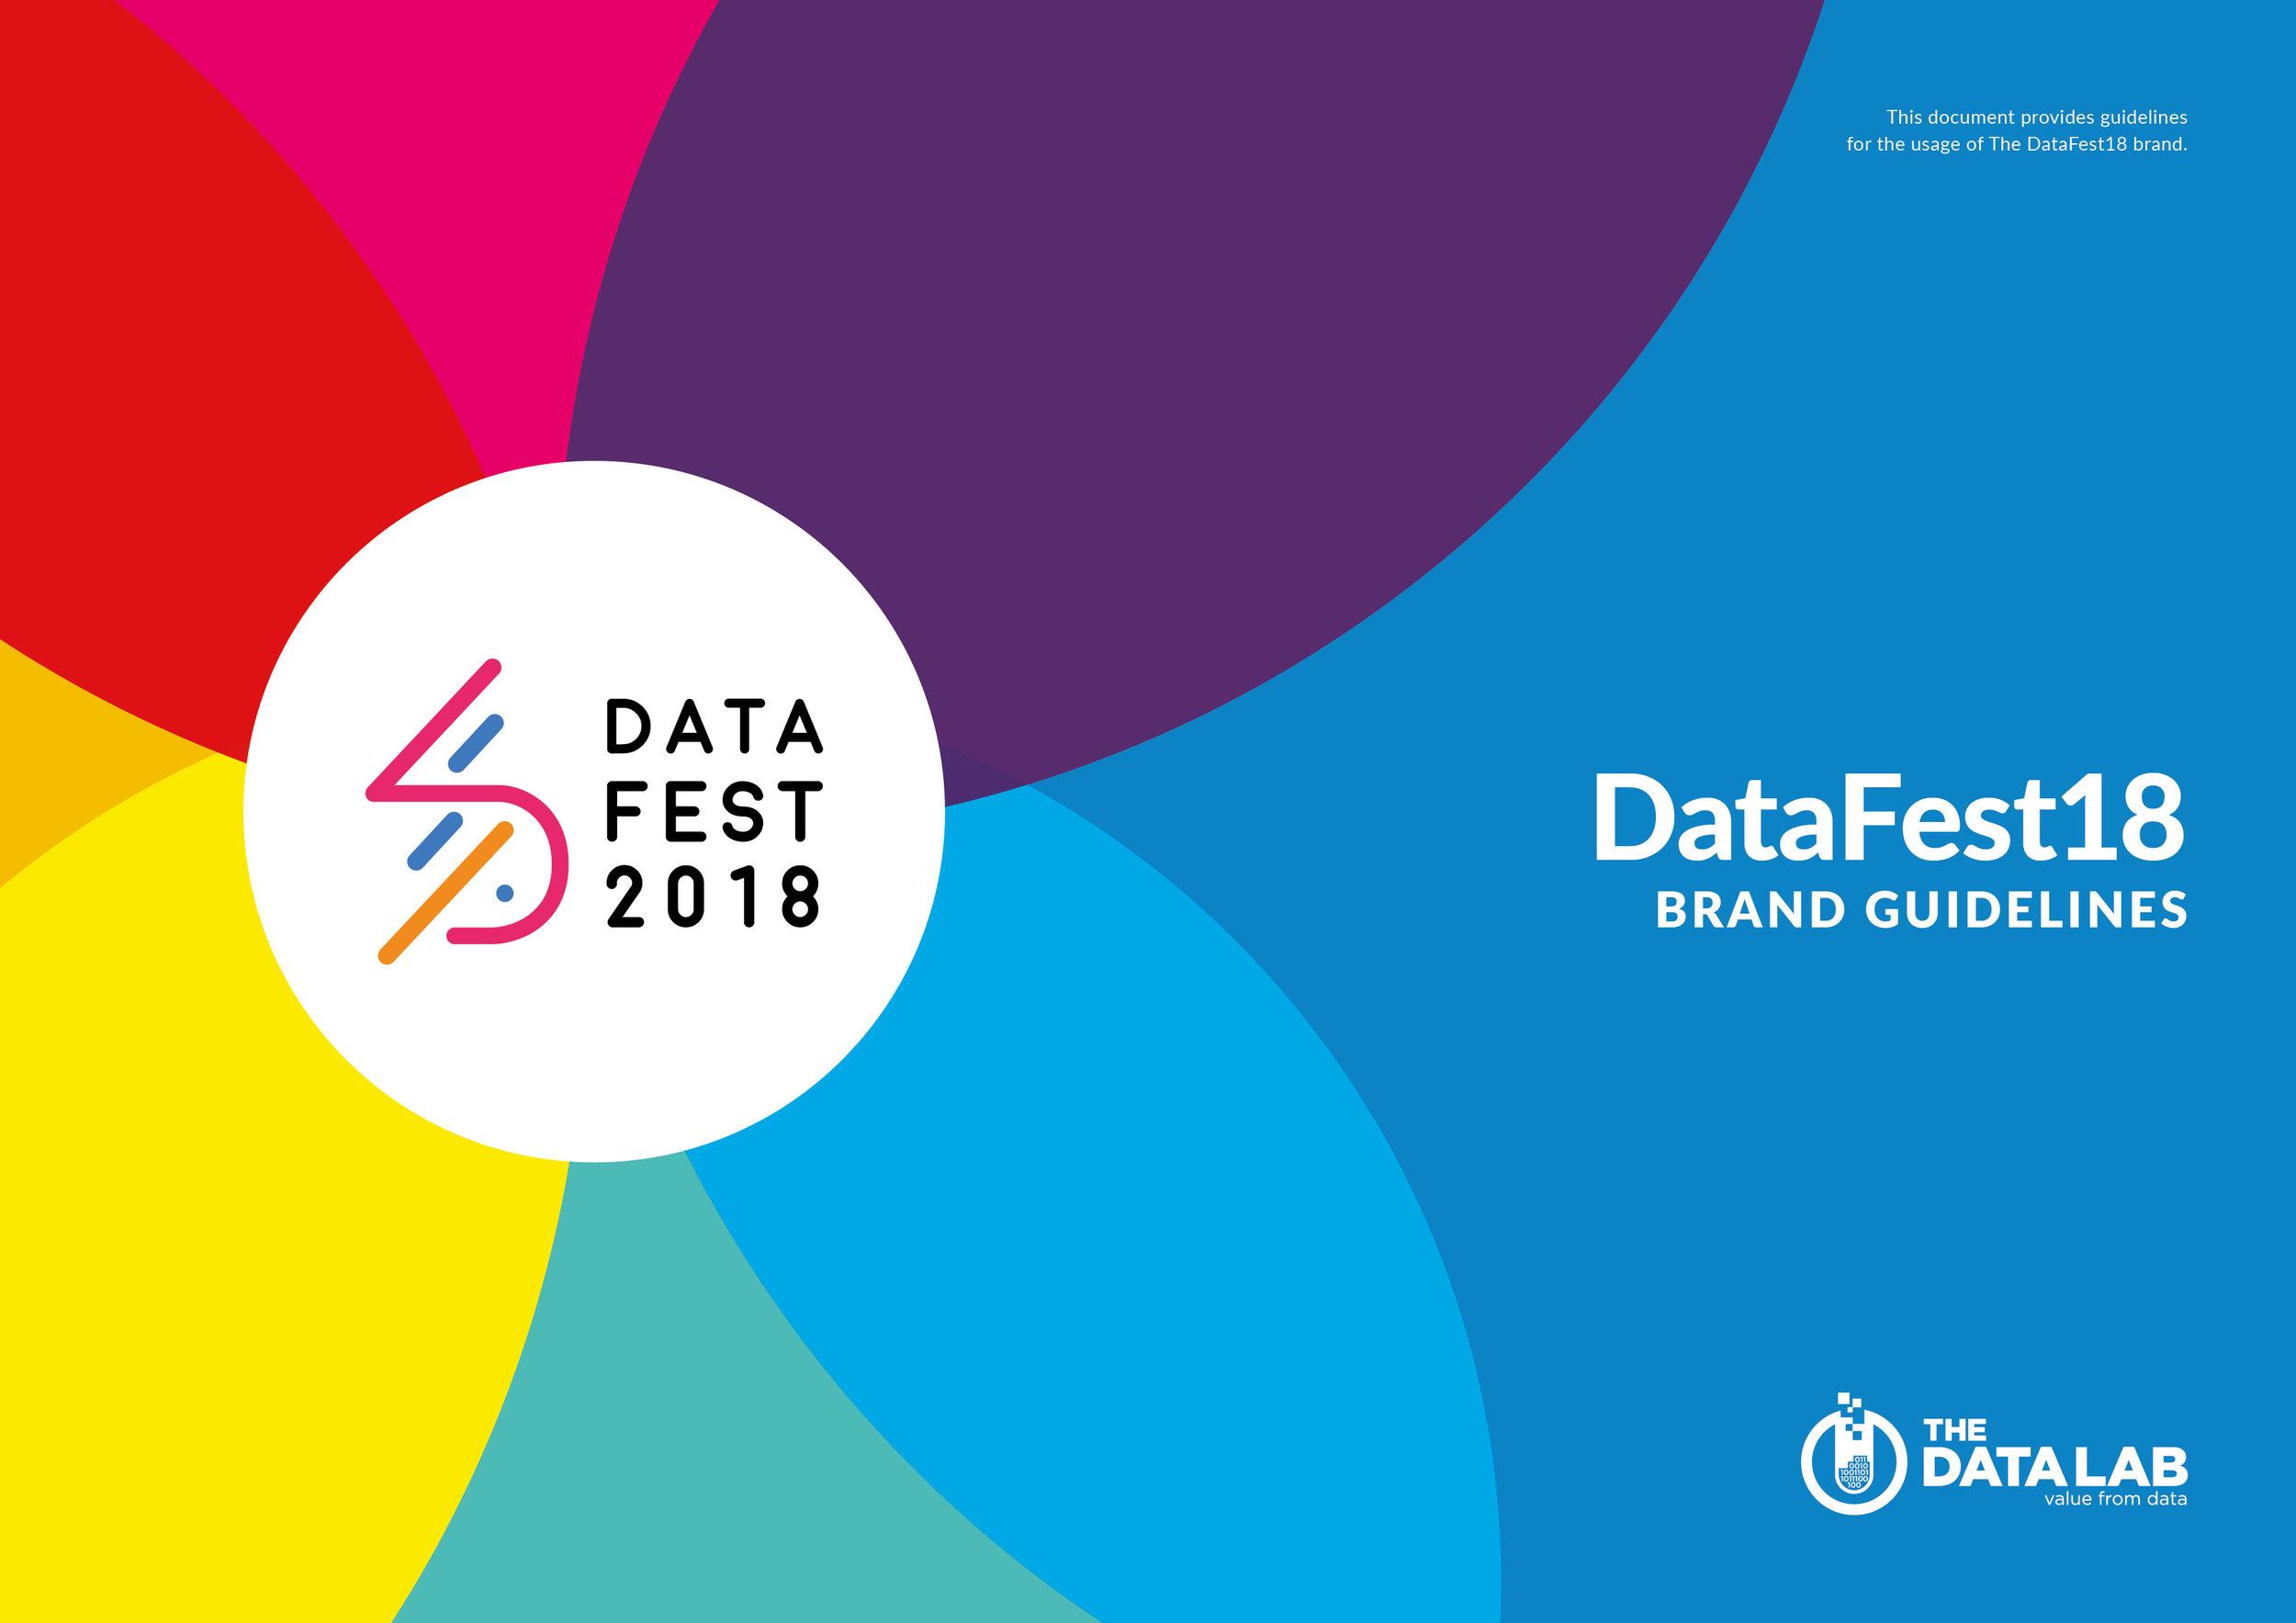 DataFest Guidelines Cover